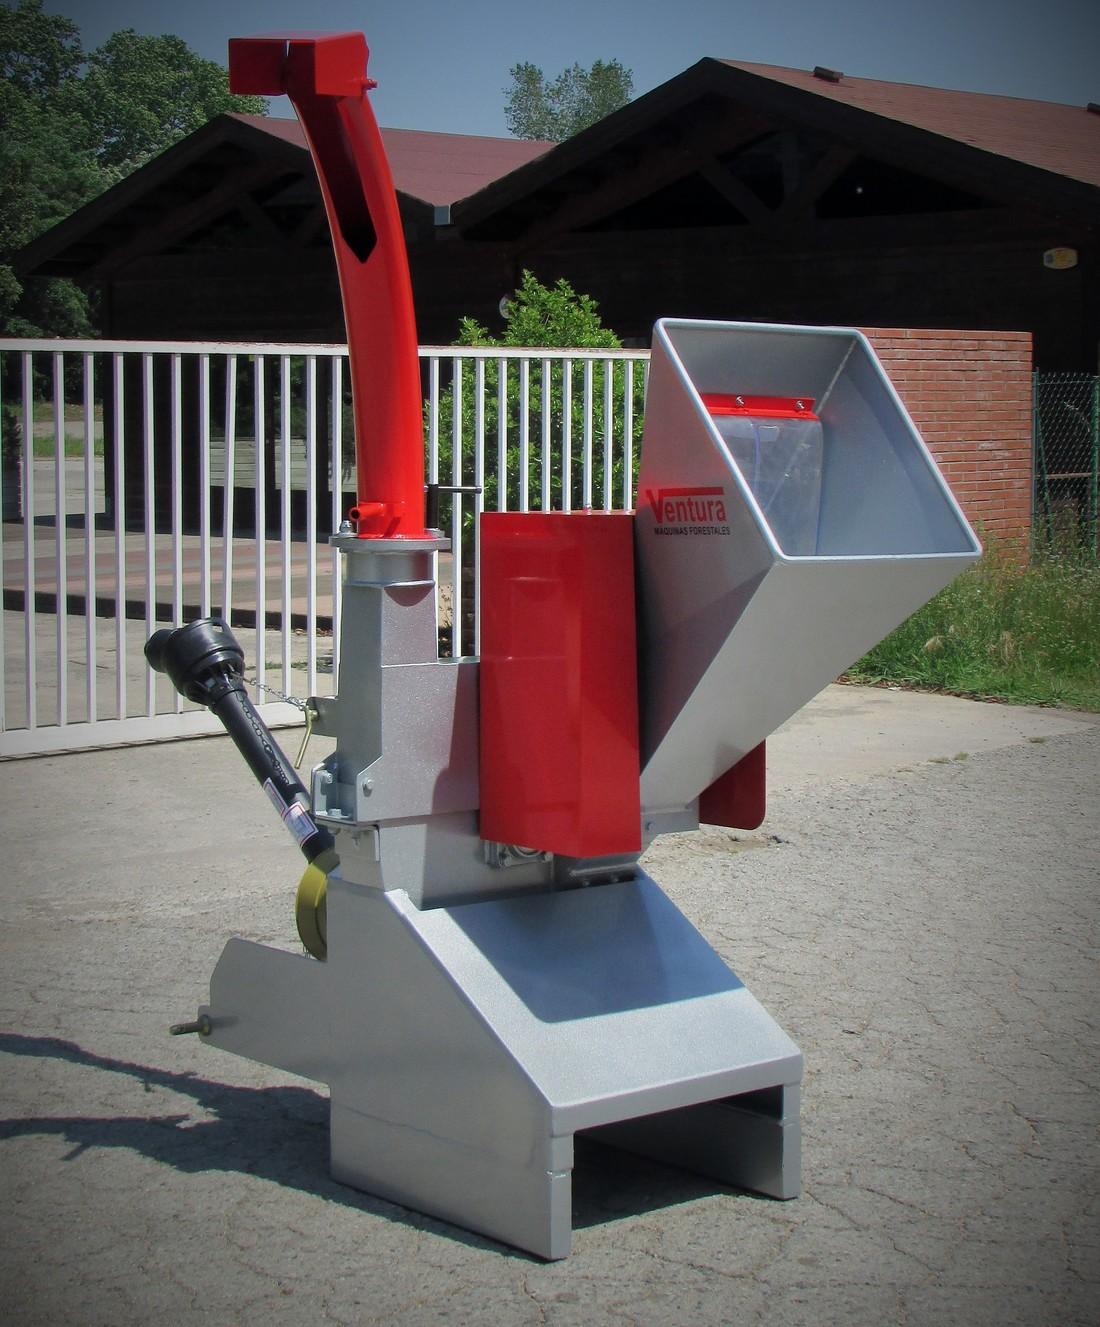 atv-100-2-3